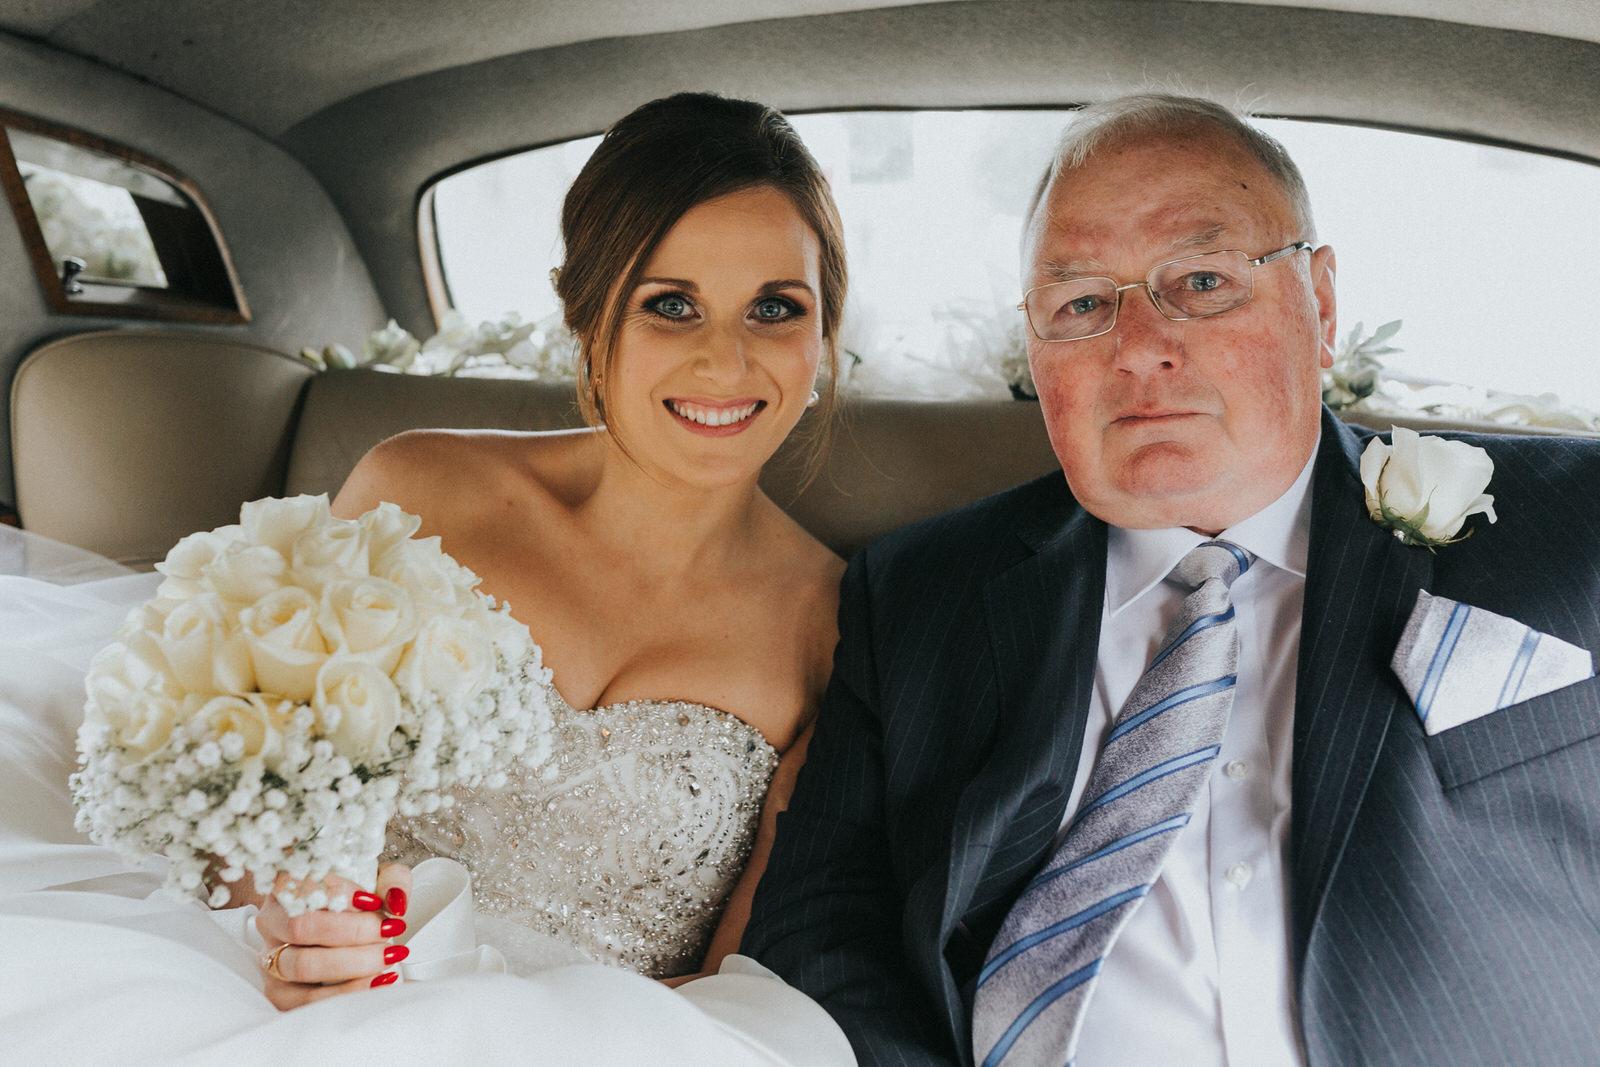 Clonabreany_wedding-photographer_roger_kenny_ireland_042.jpg